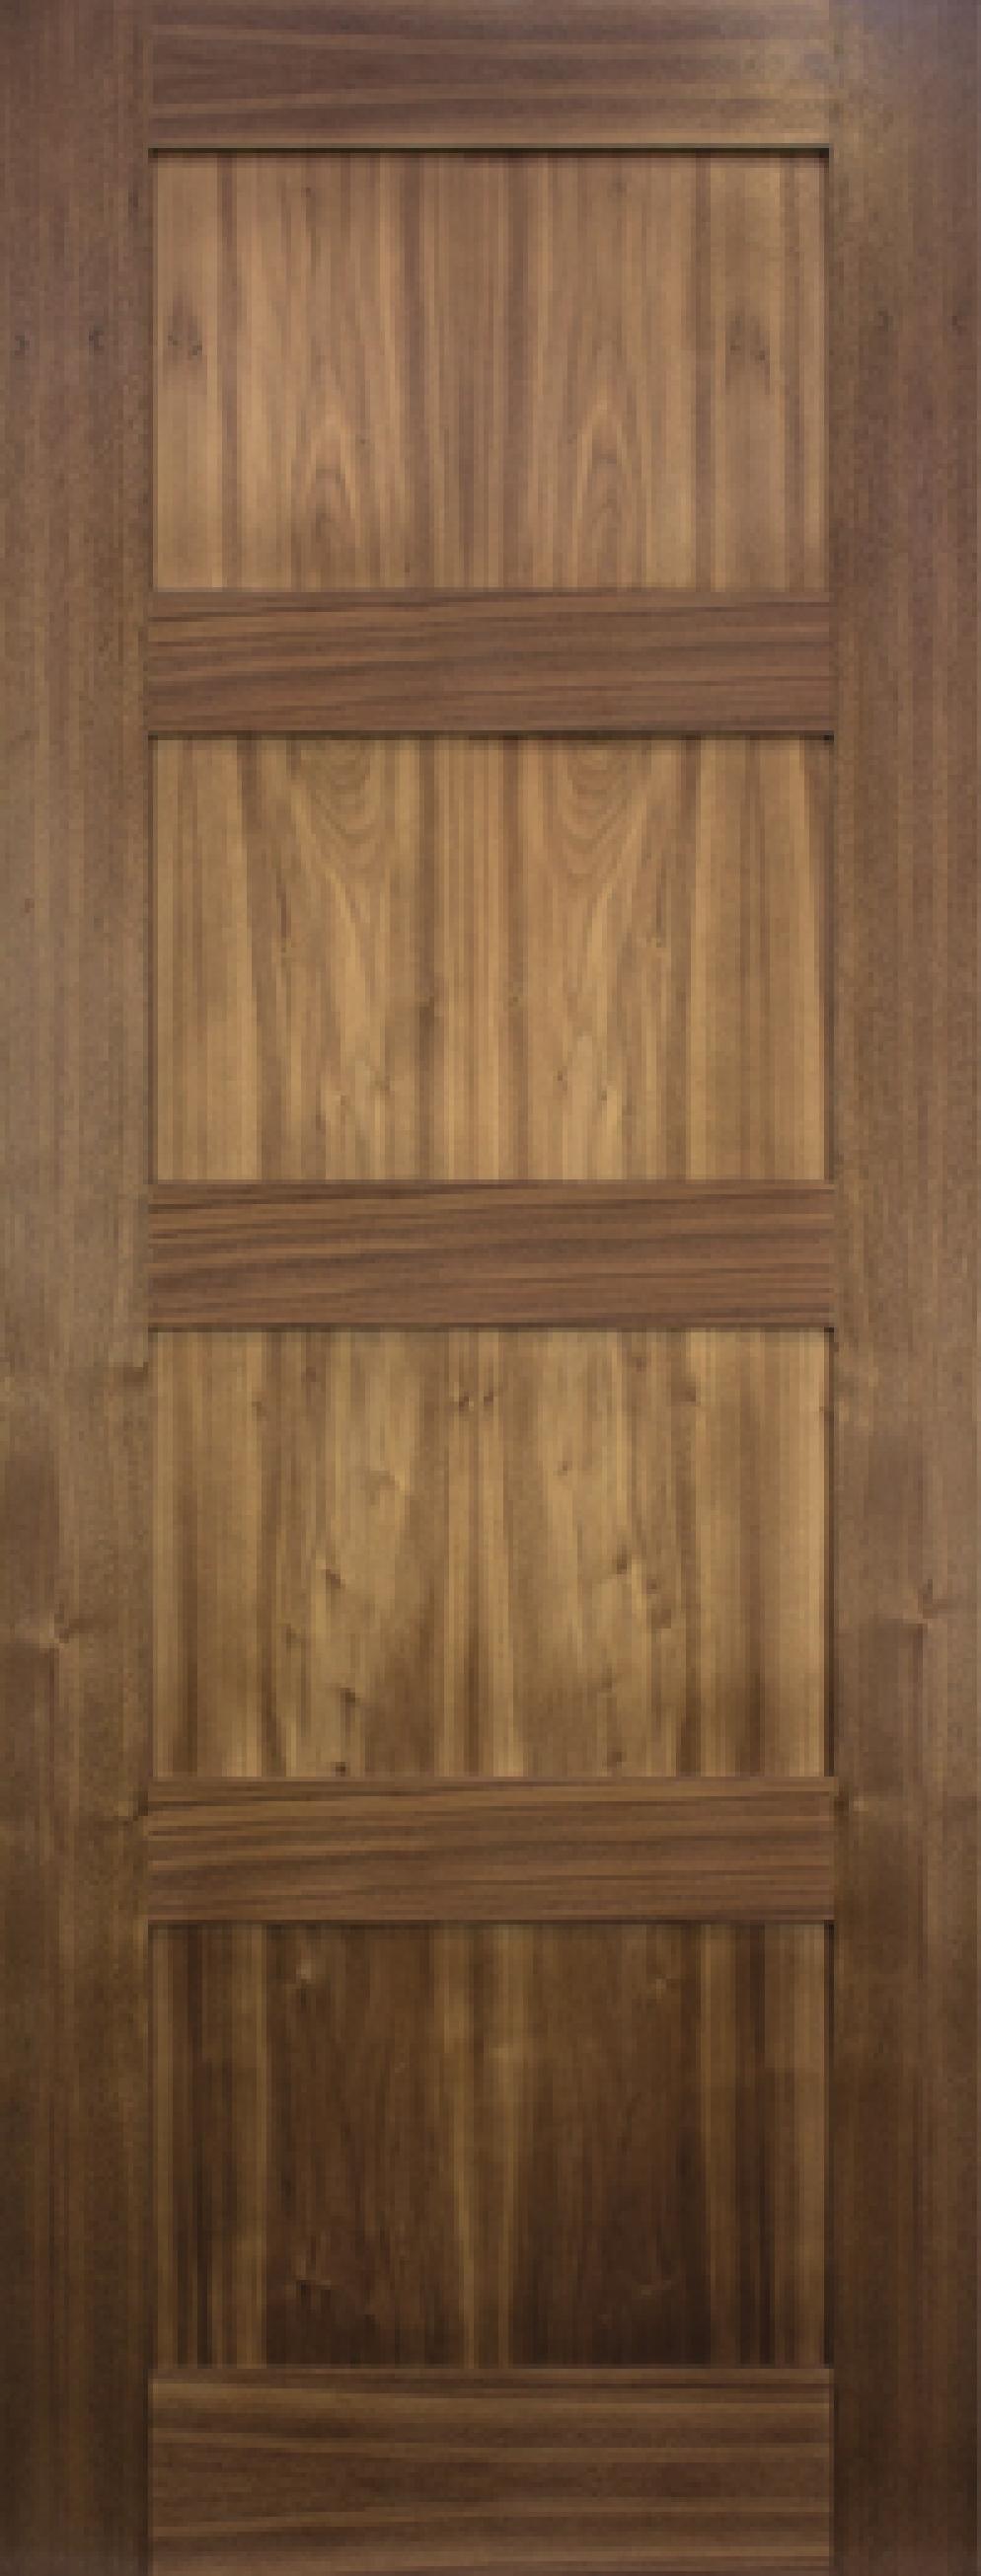 Coventry Walnut Door - Prefinished